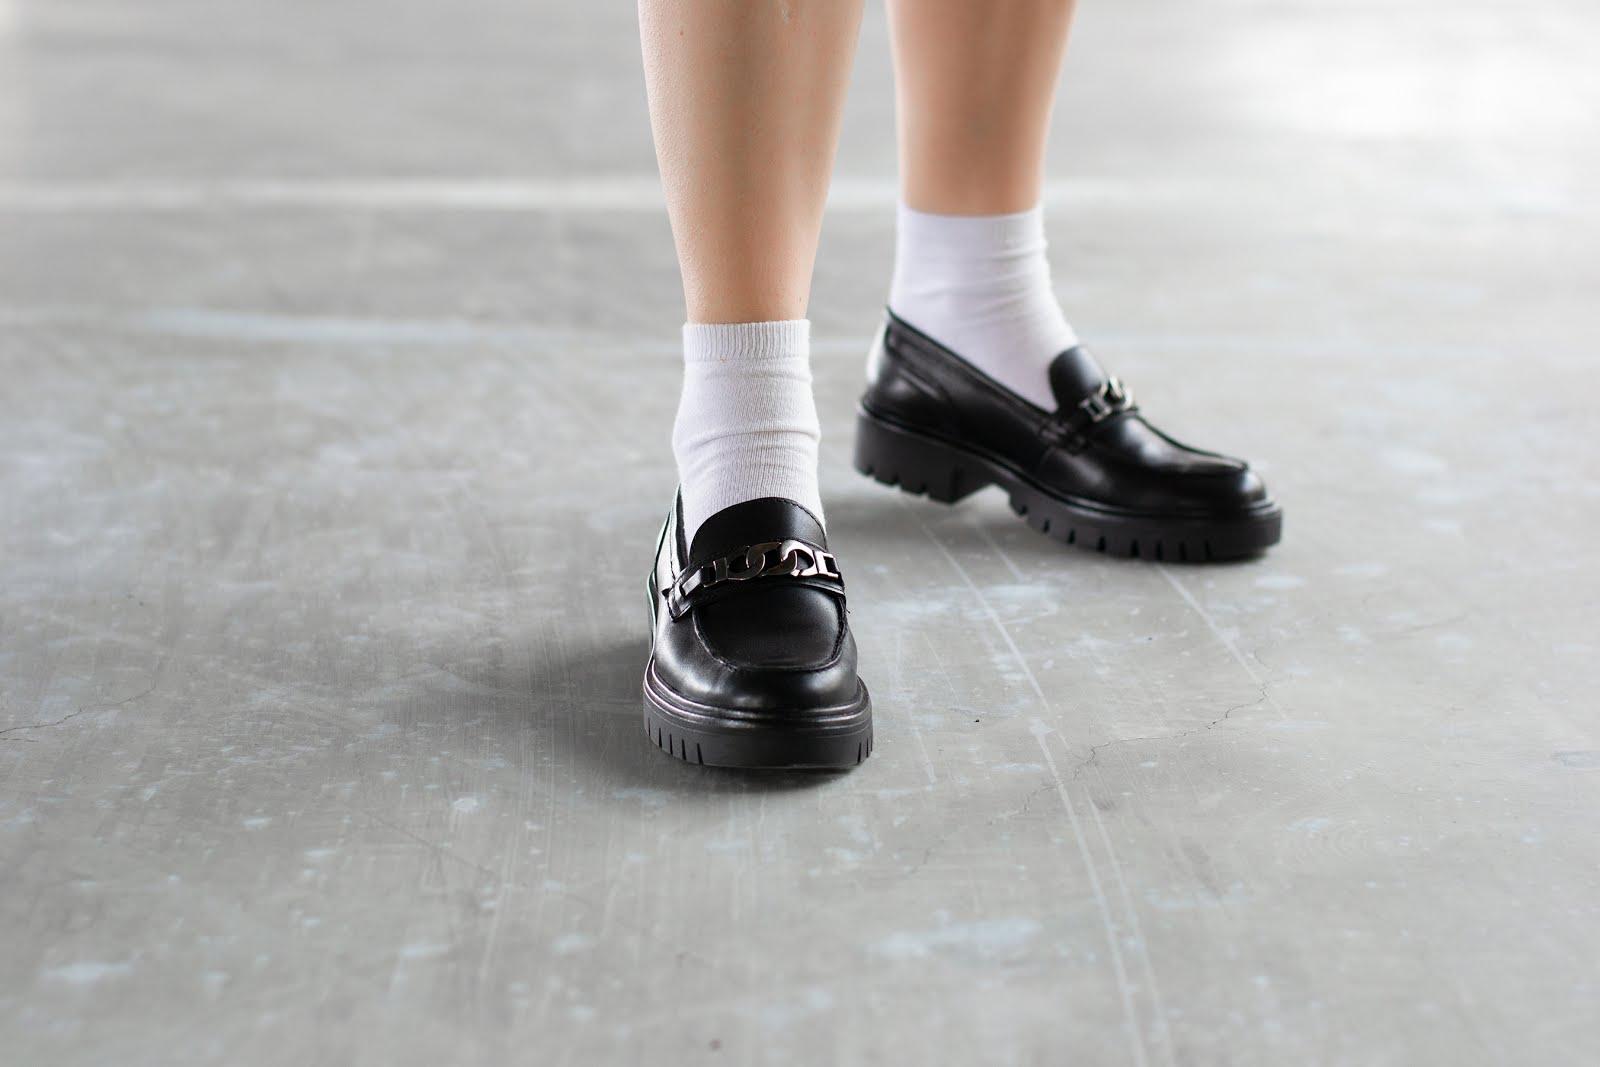 Chunky loafers, sacha shoes, edgy dress, weekday, jurk, casual, oversized, minimal, street style, plateau zool